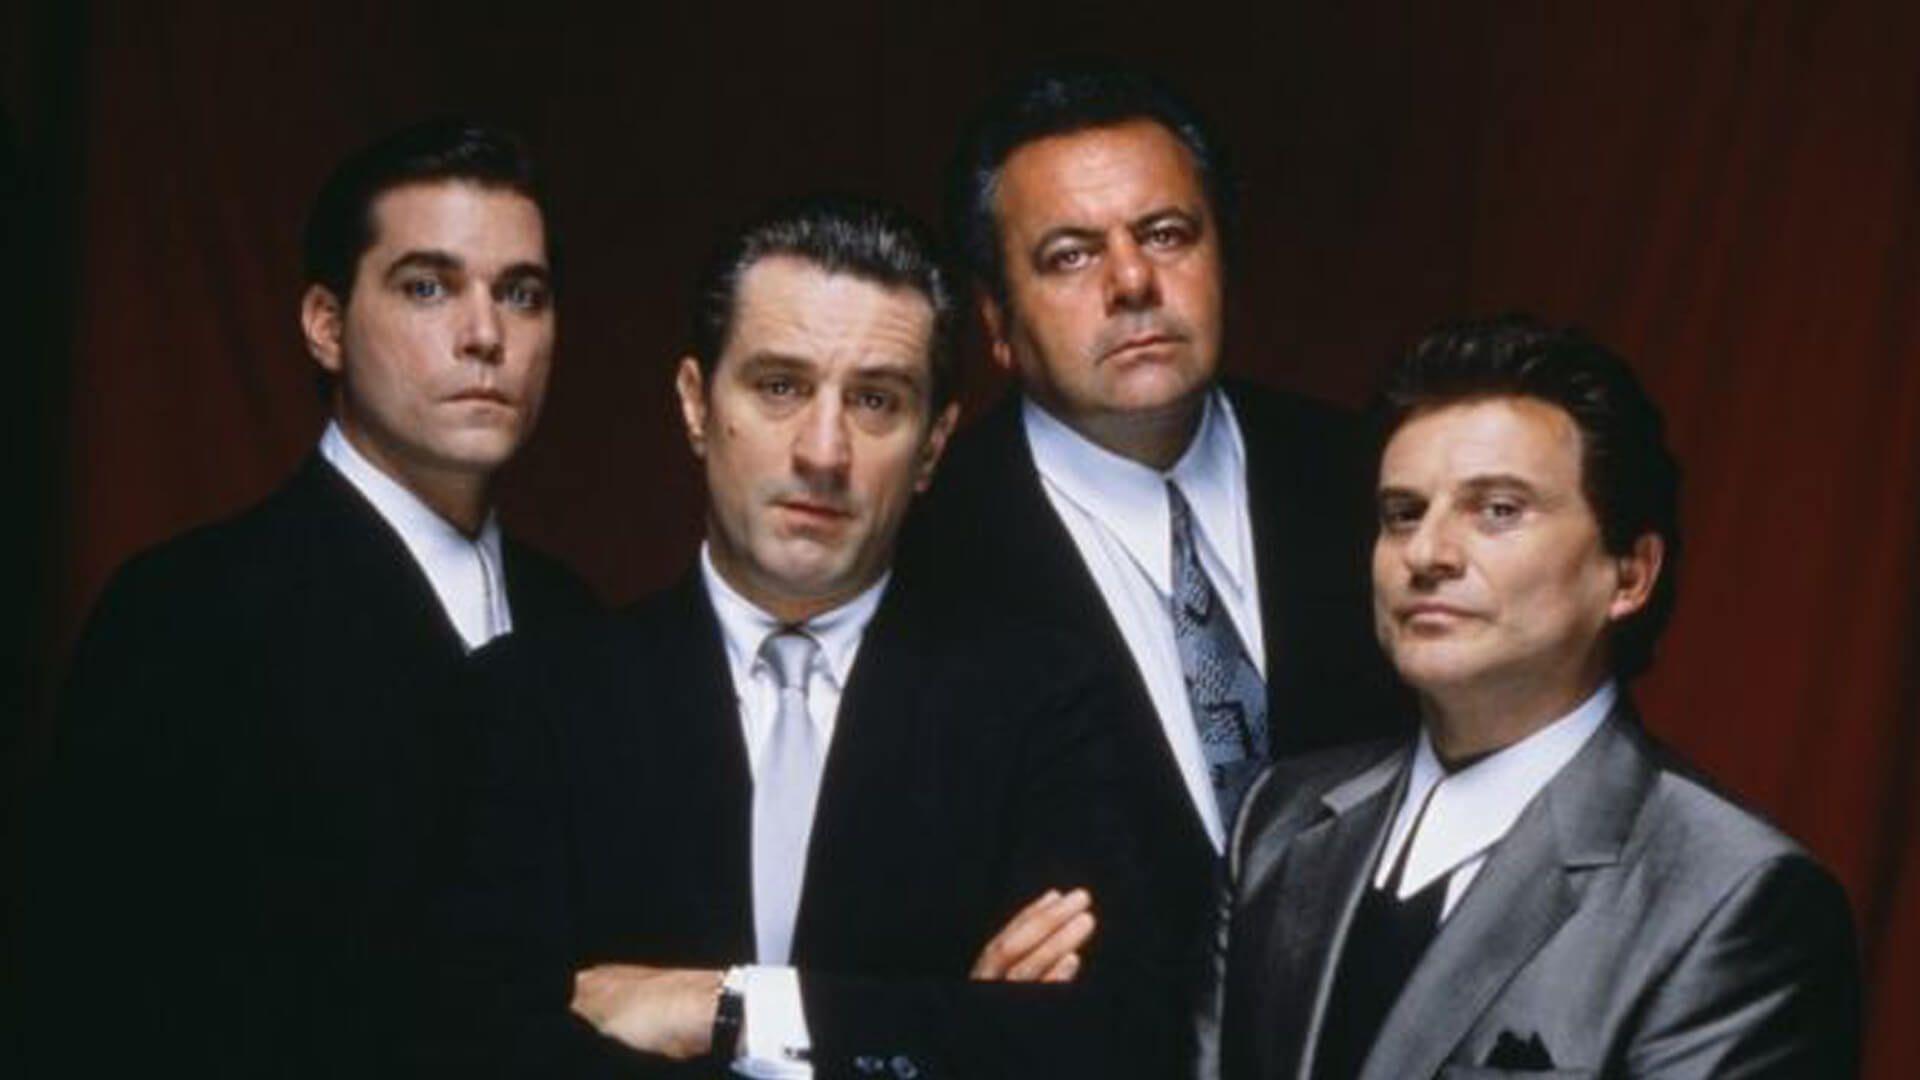 Italian Mafia Wallpapers Top Free Italian Mafia Backgrounds